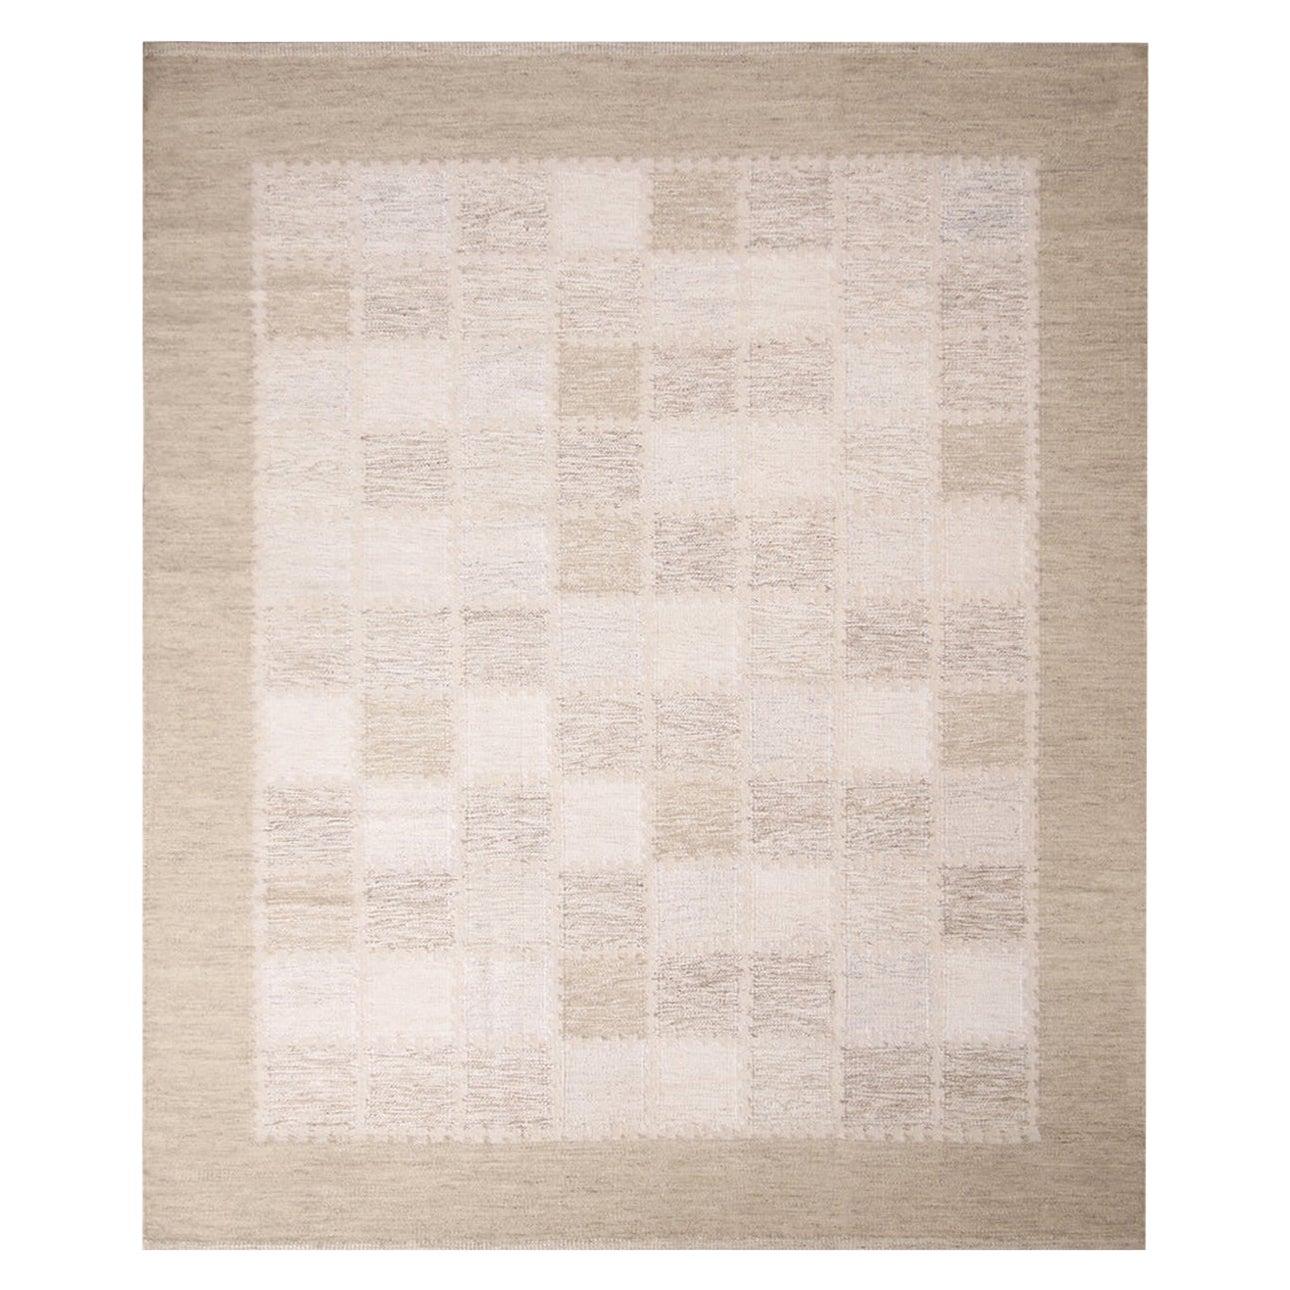 Rug & Kilim's Scandinavian-Inspired Beige Gray and Light Brown Wool Pile Rug